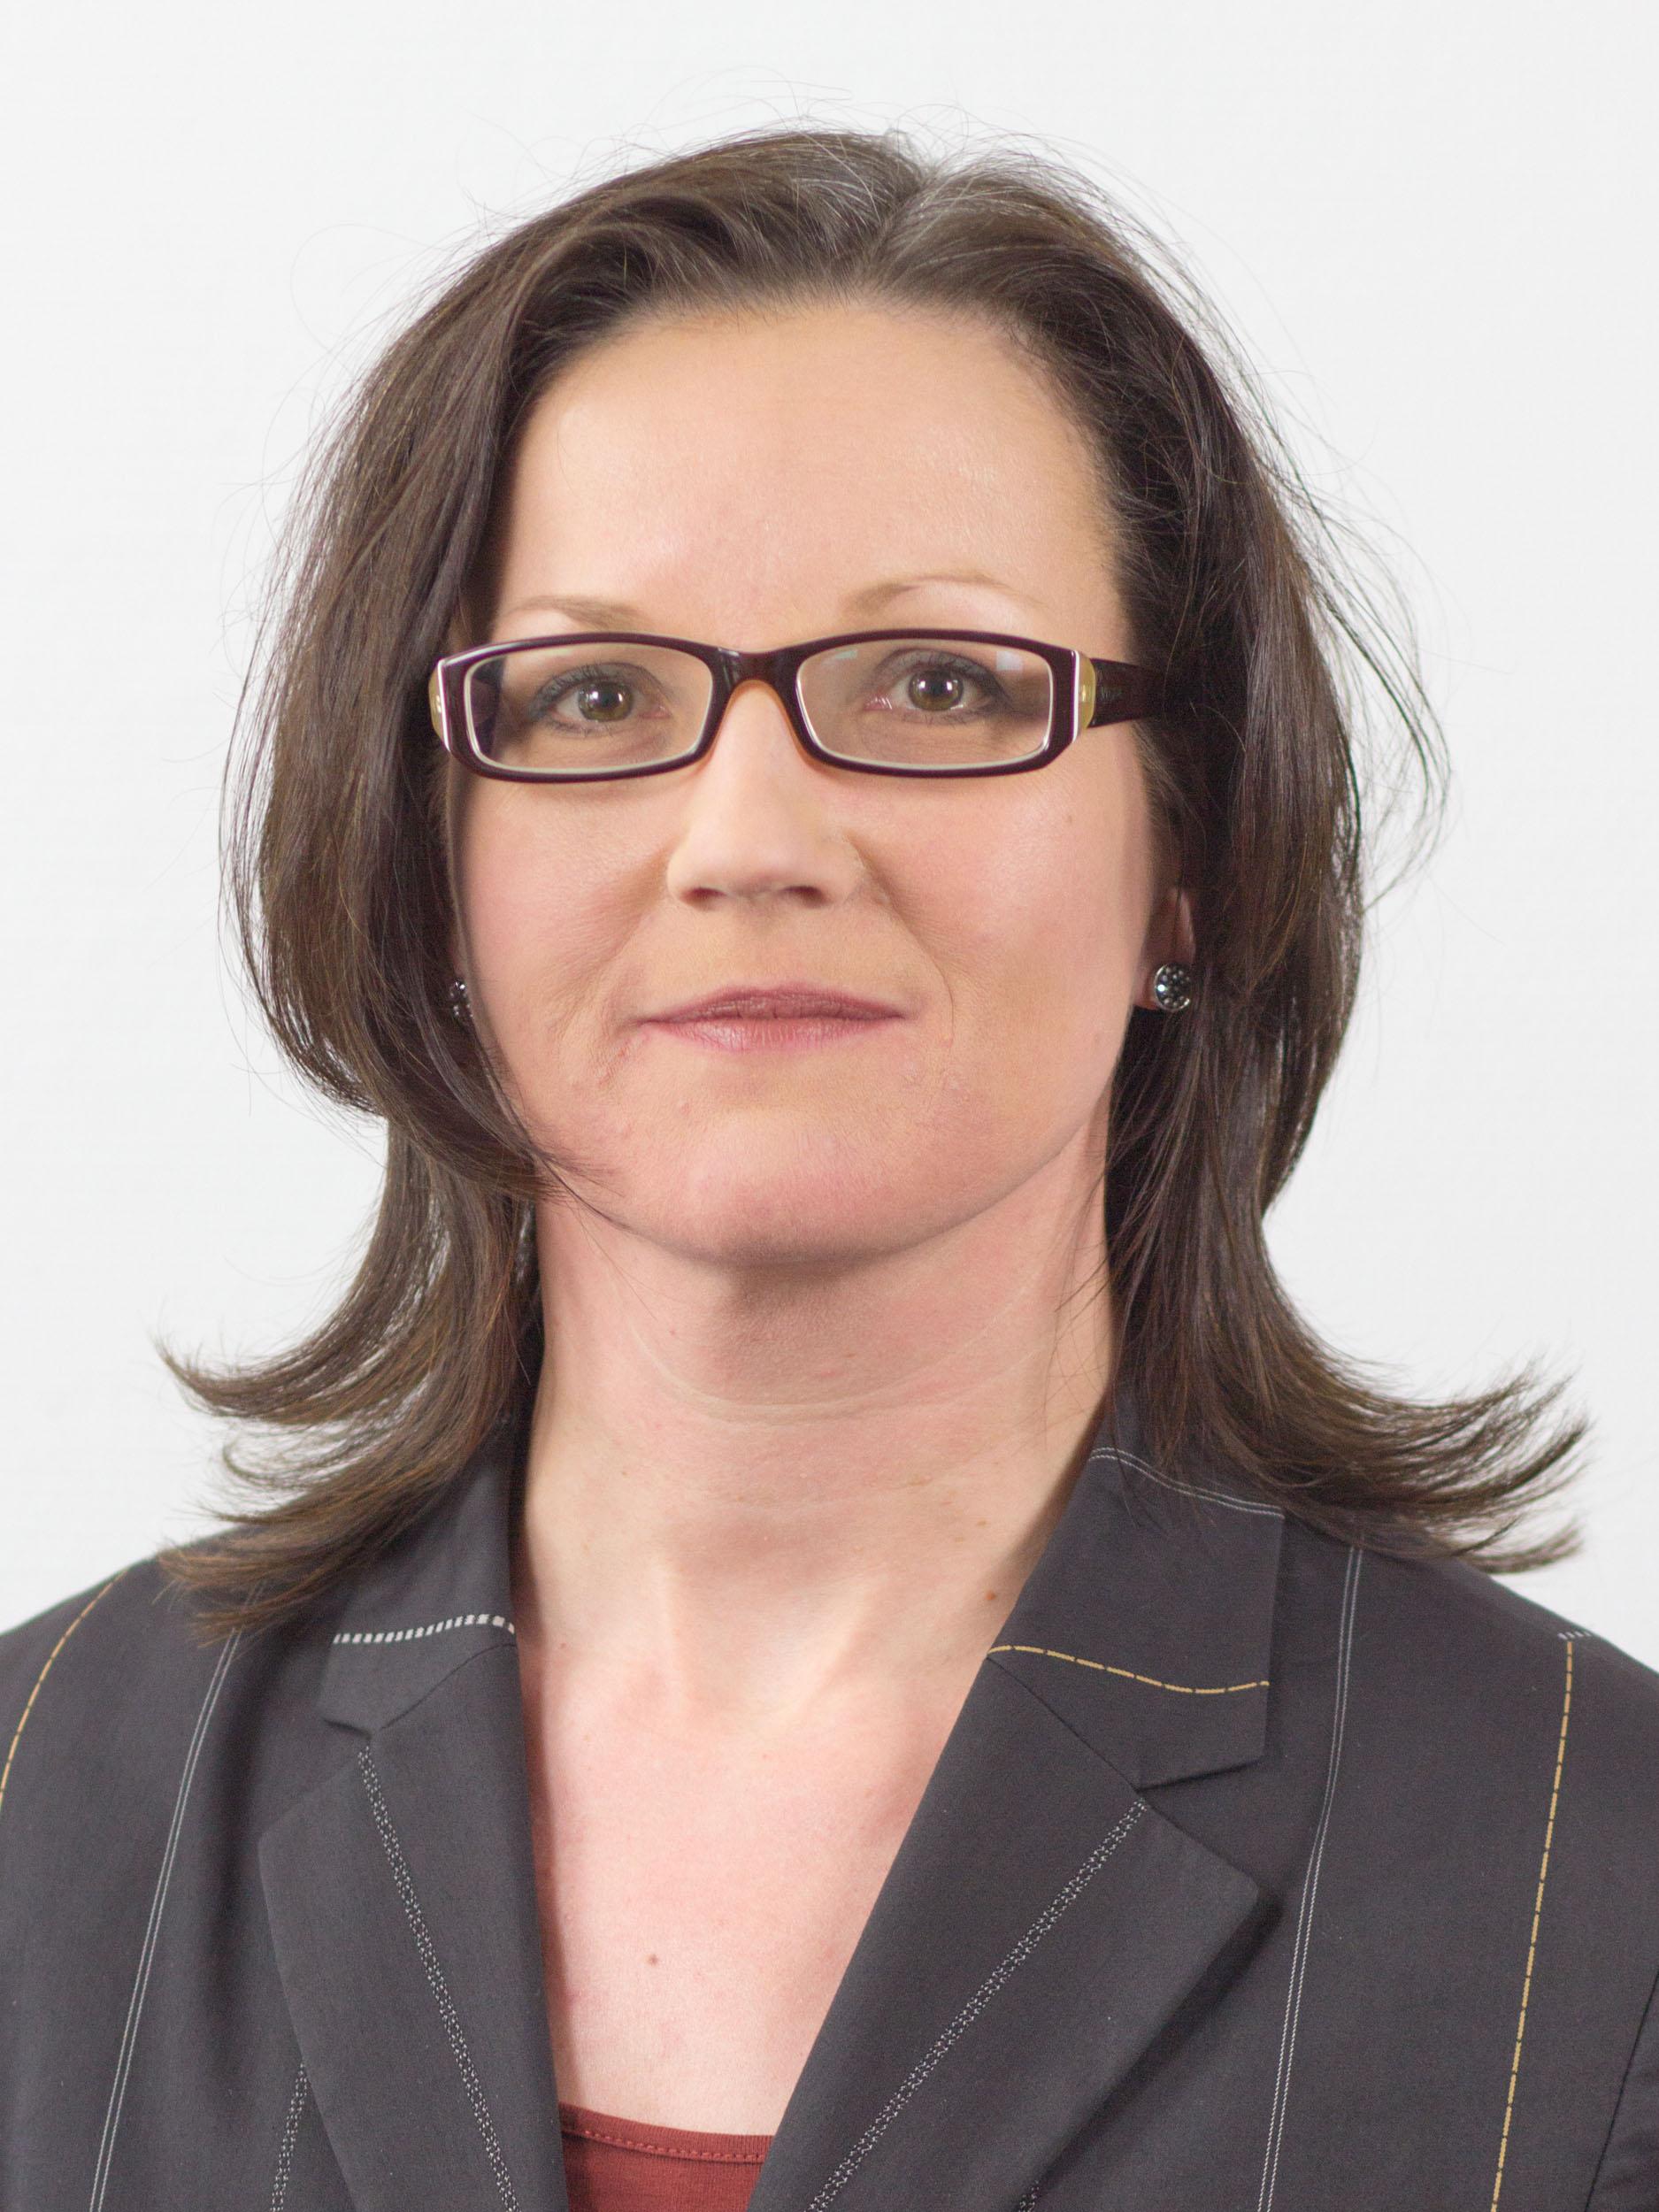 Andrea Kuhlmann